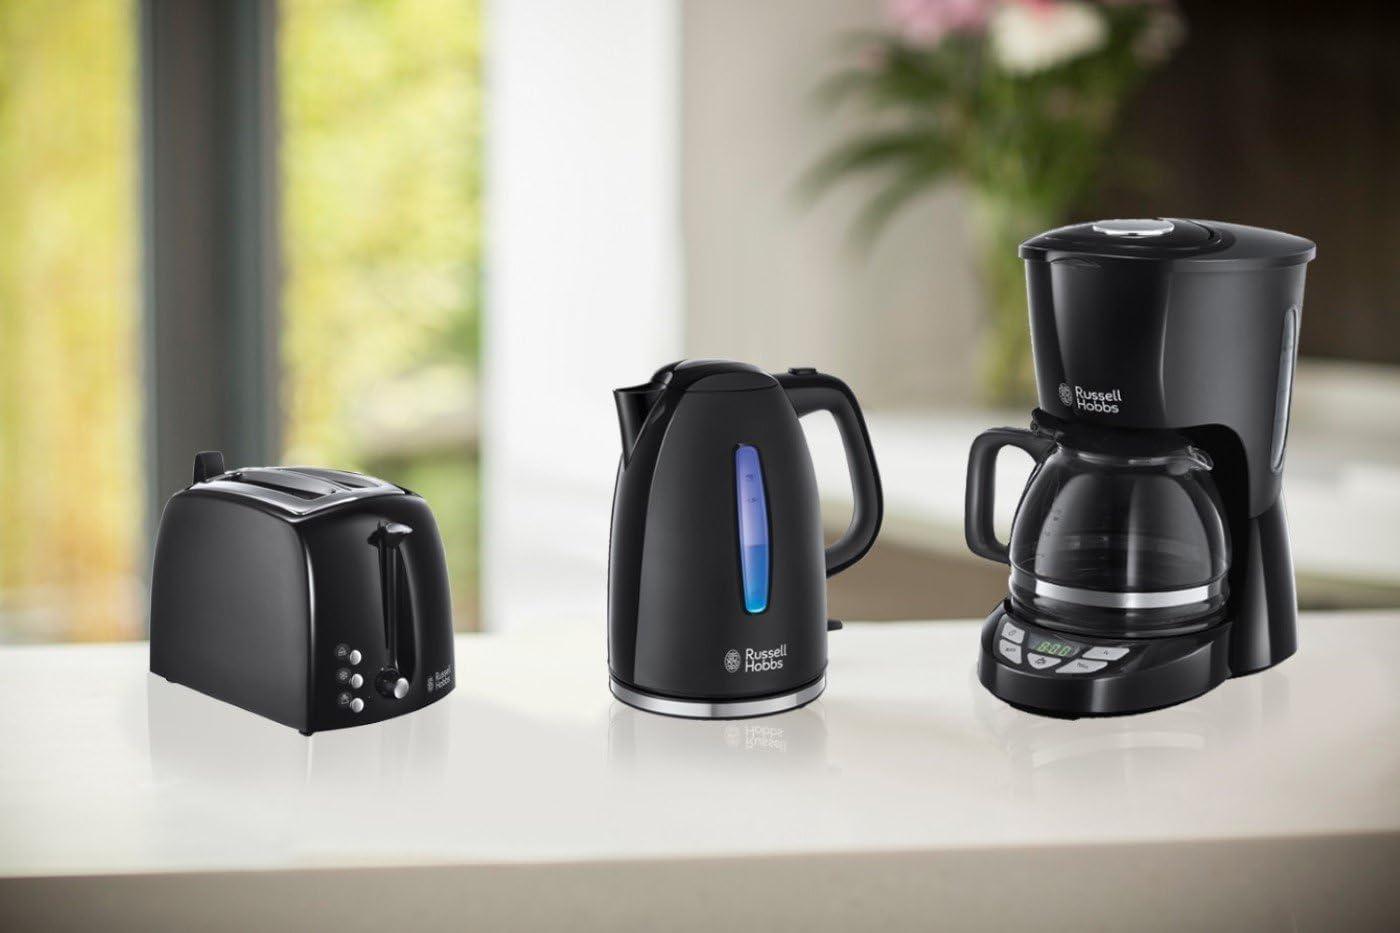 Das ultimative Frühstücksset – Kaffeemaschine Toaster Wasserkocher